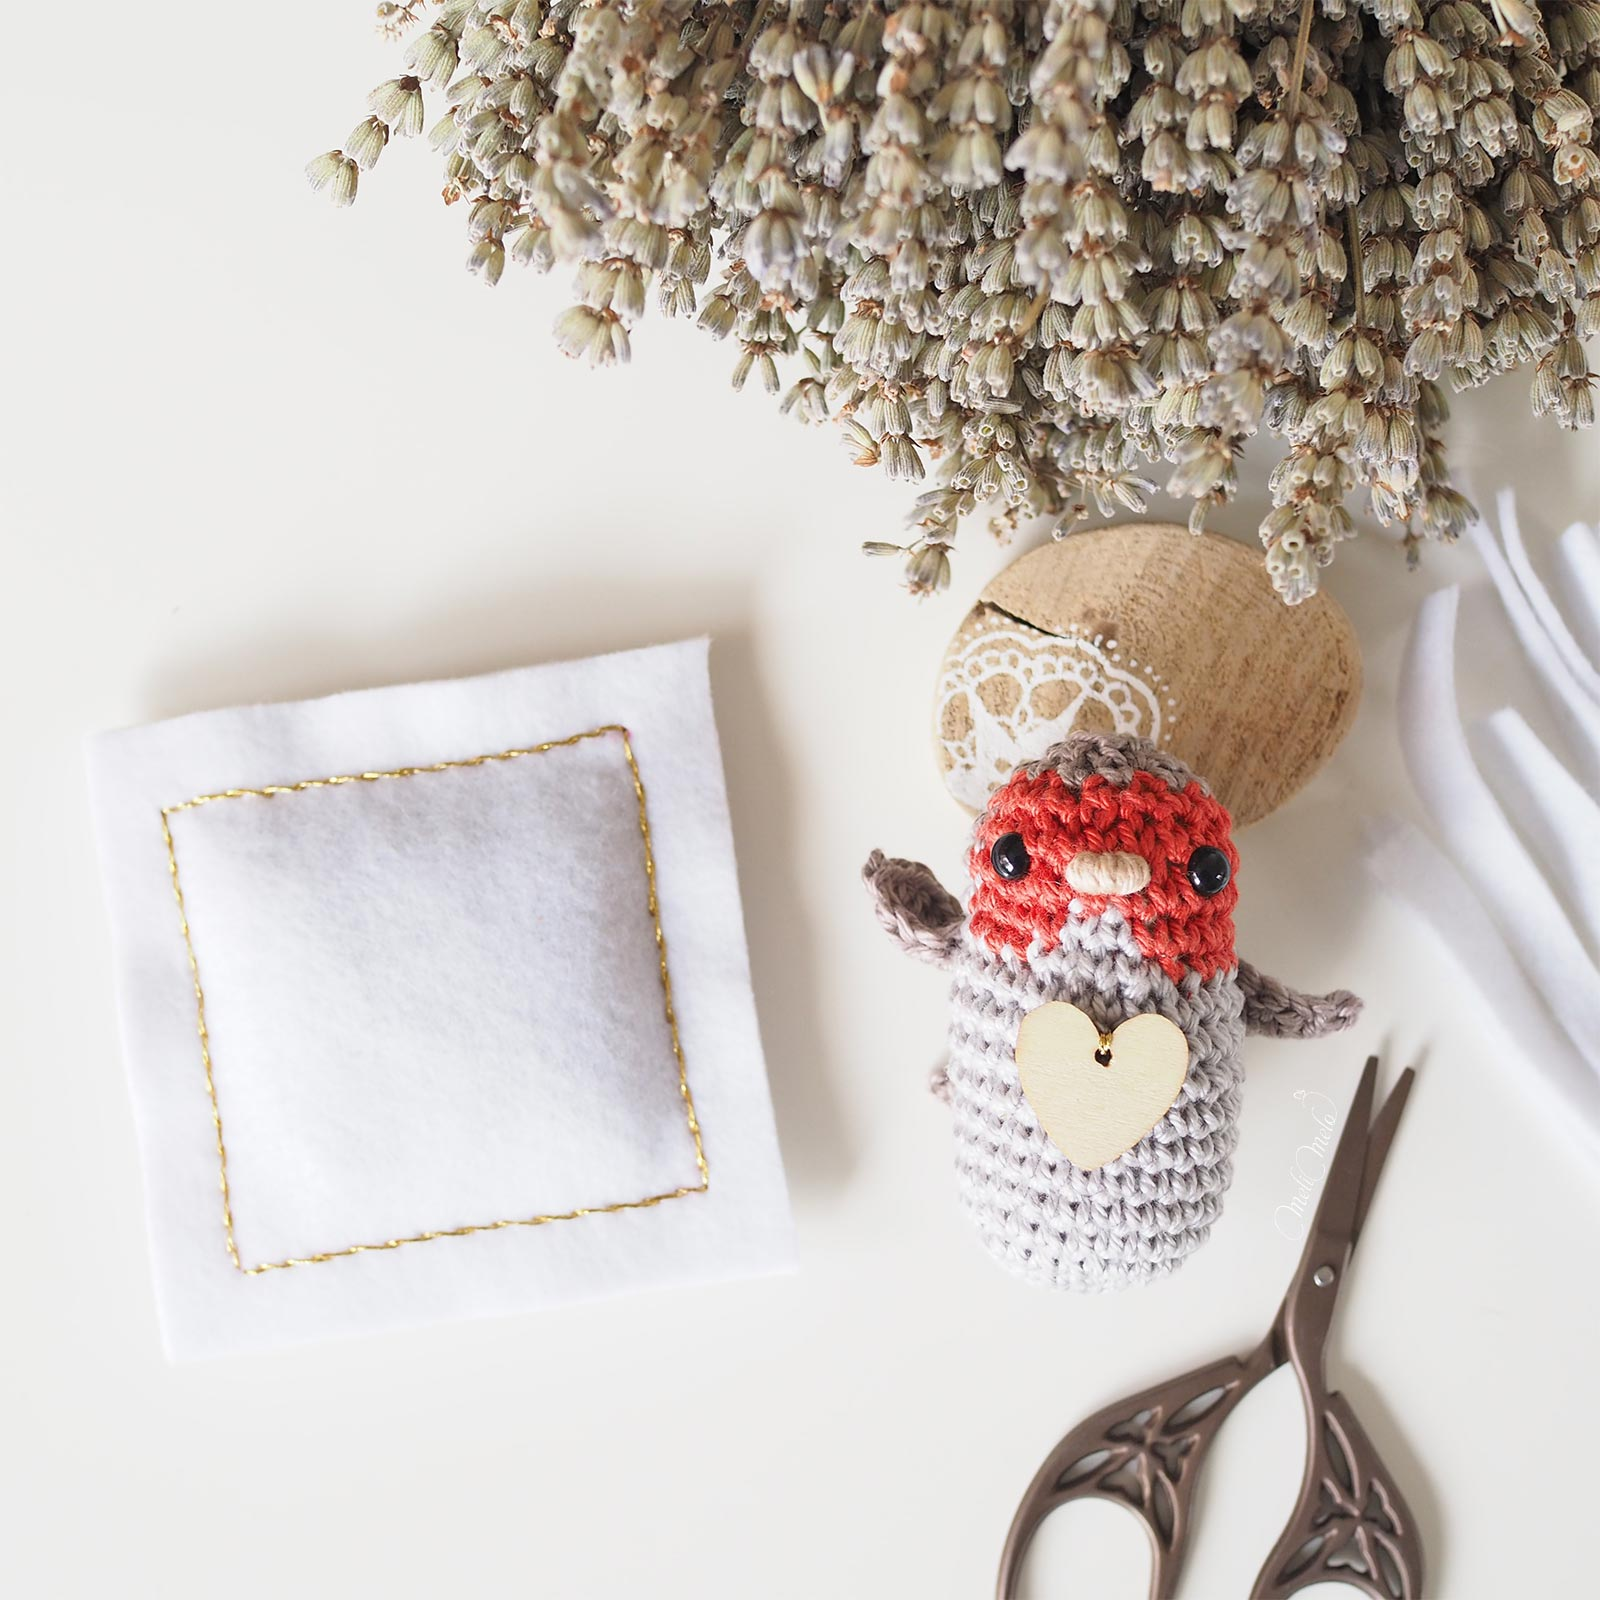 tiny cushion lavender crochet robin bird Boutique MeliMelo